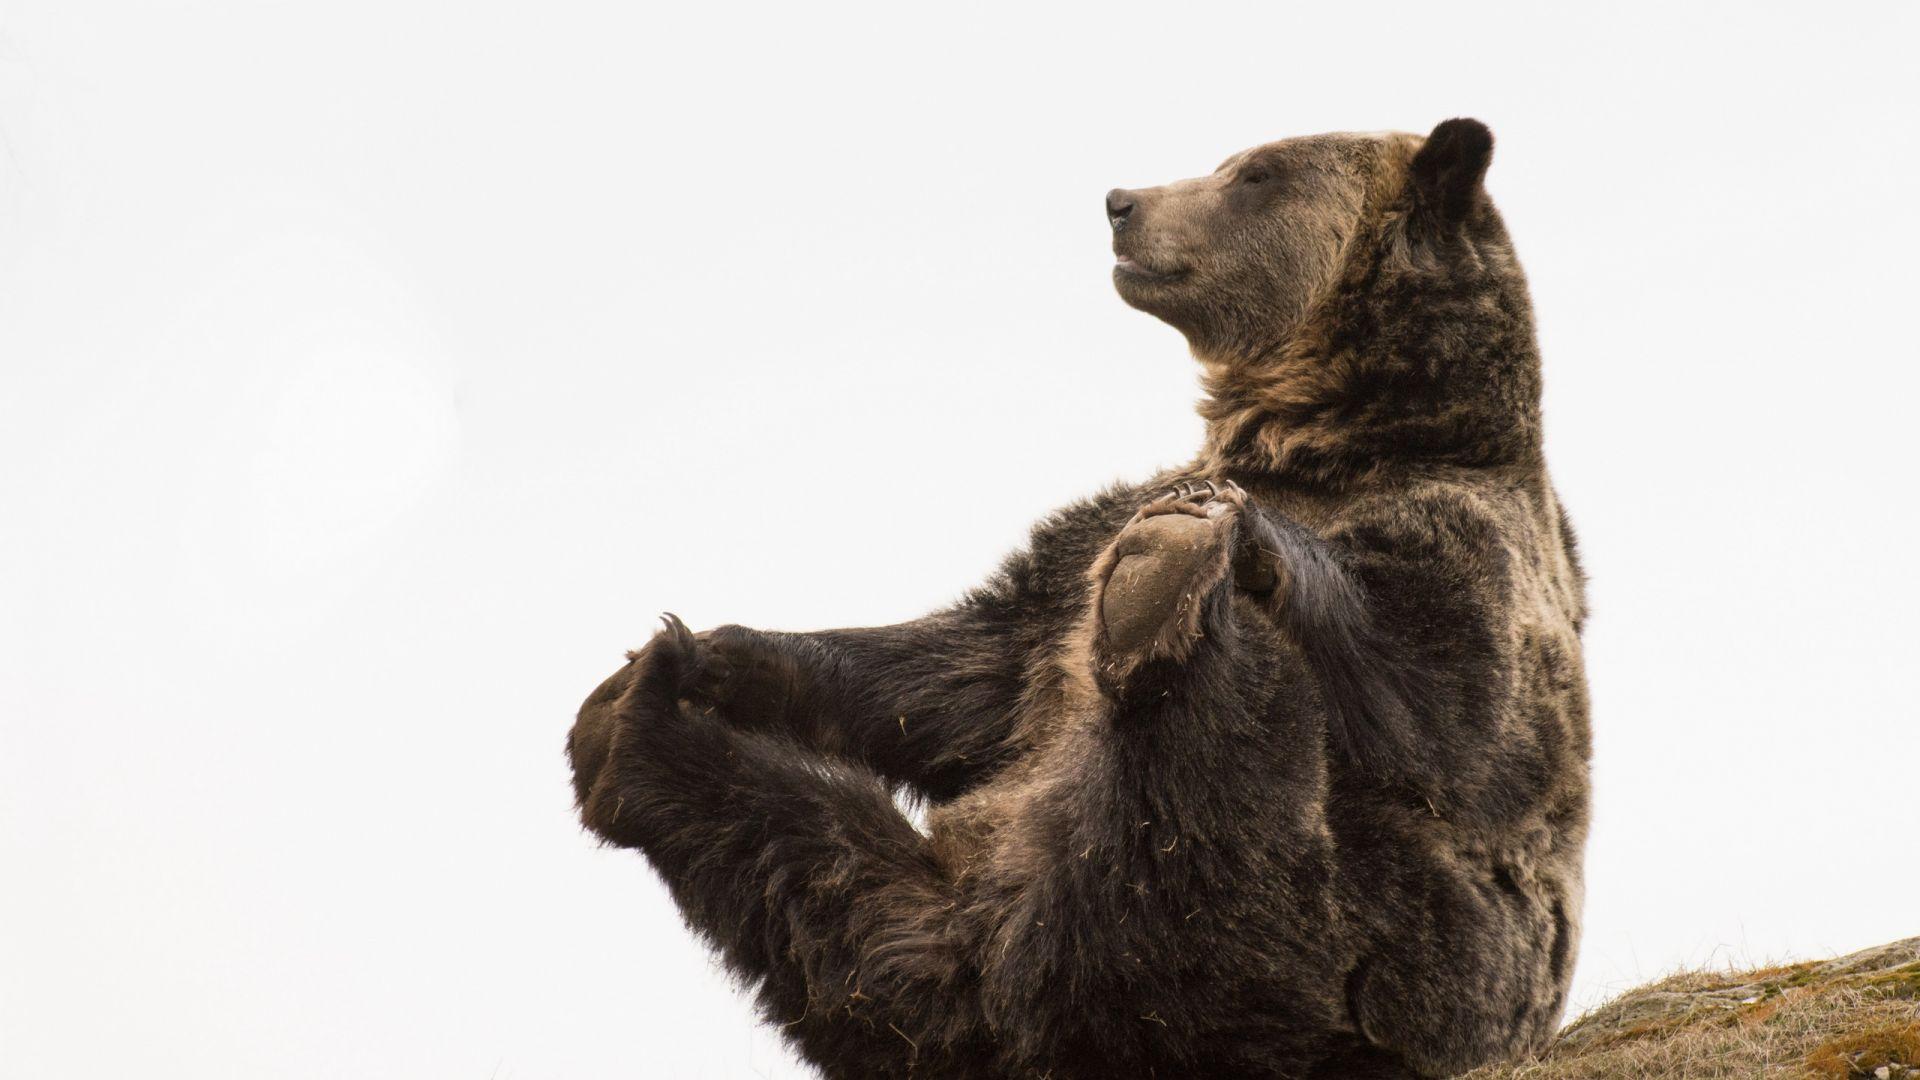 Wallpaper Bear, predator, wild animal